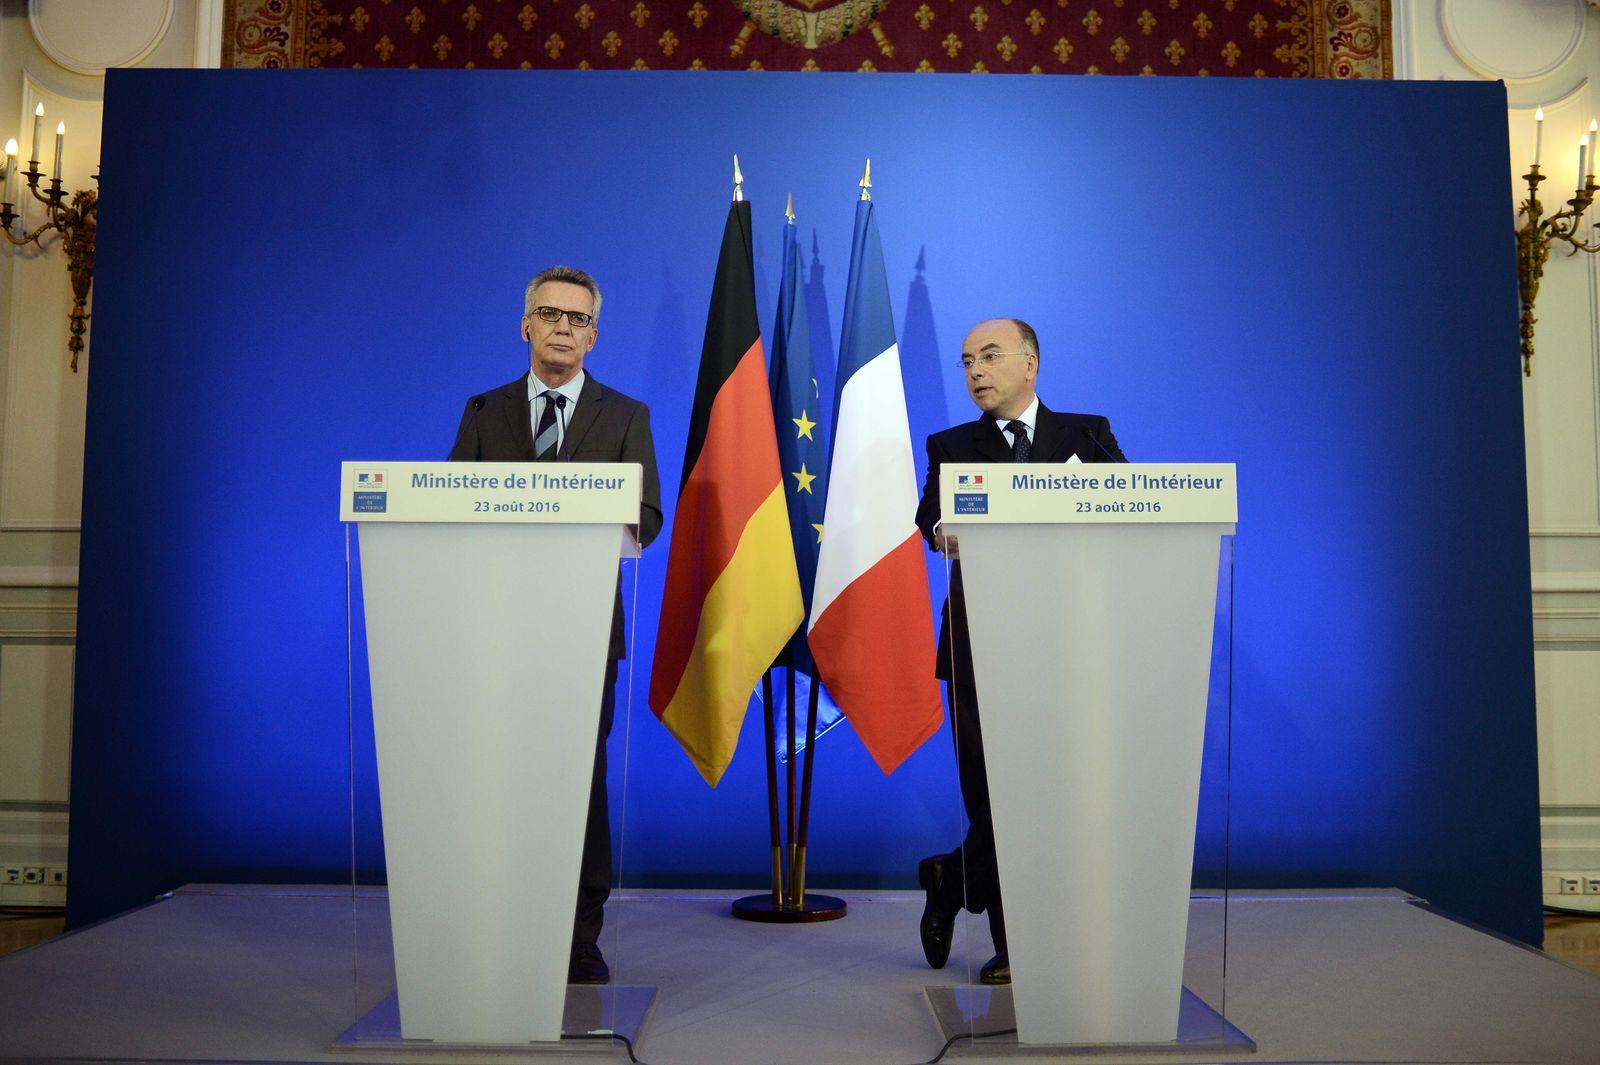 FRANCE-GERMANY-TERRORISM-POLITICS-DIPLOMACY